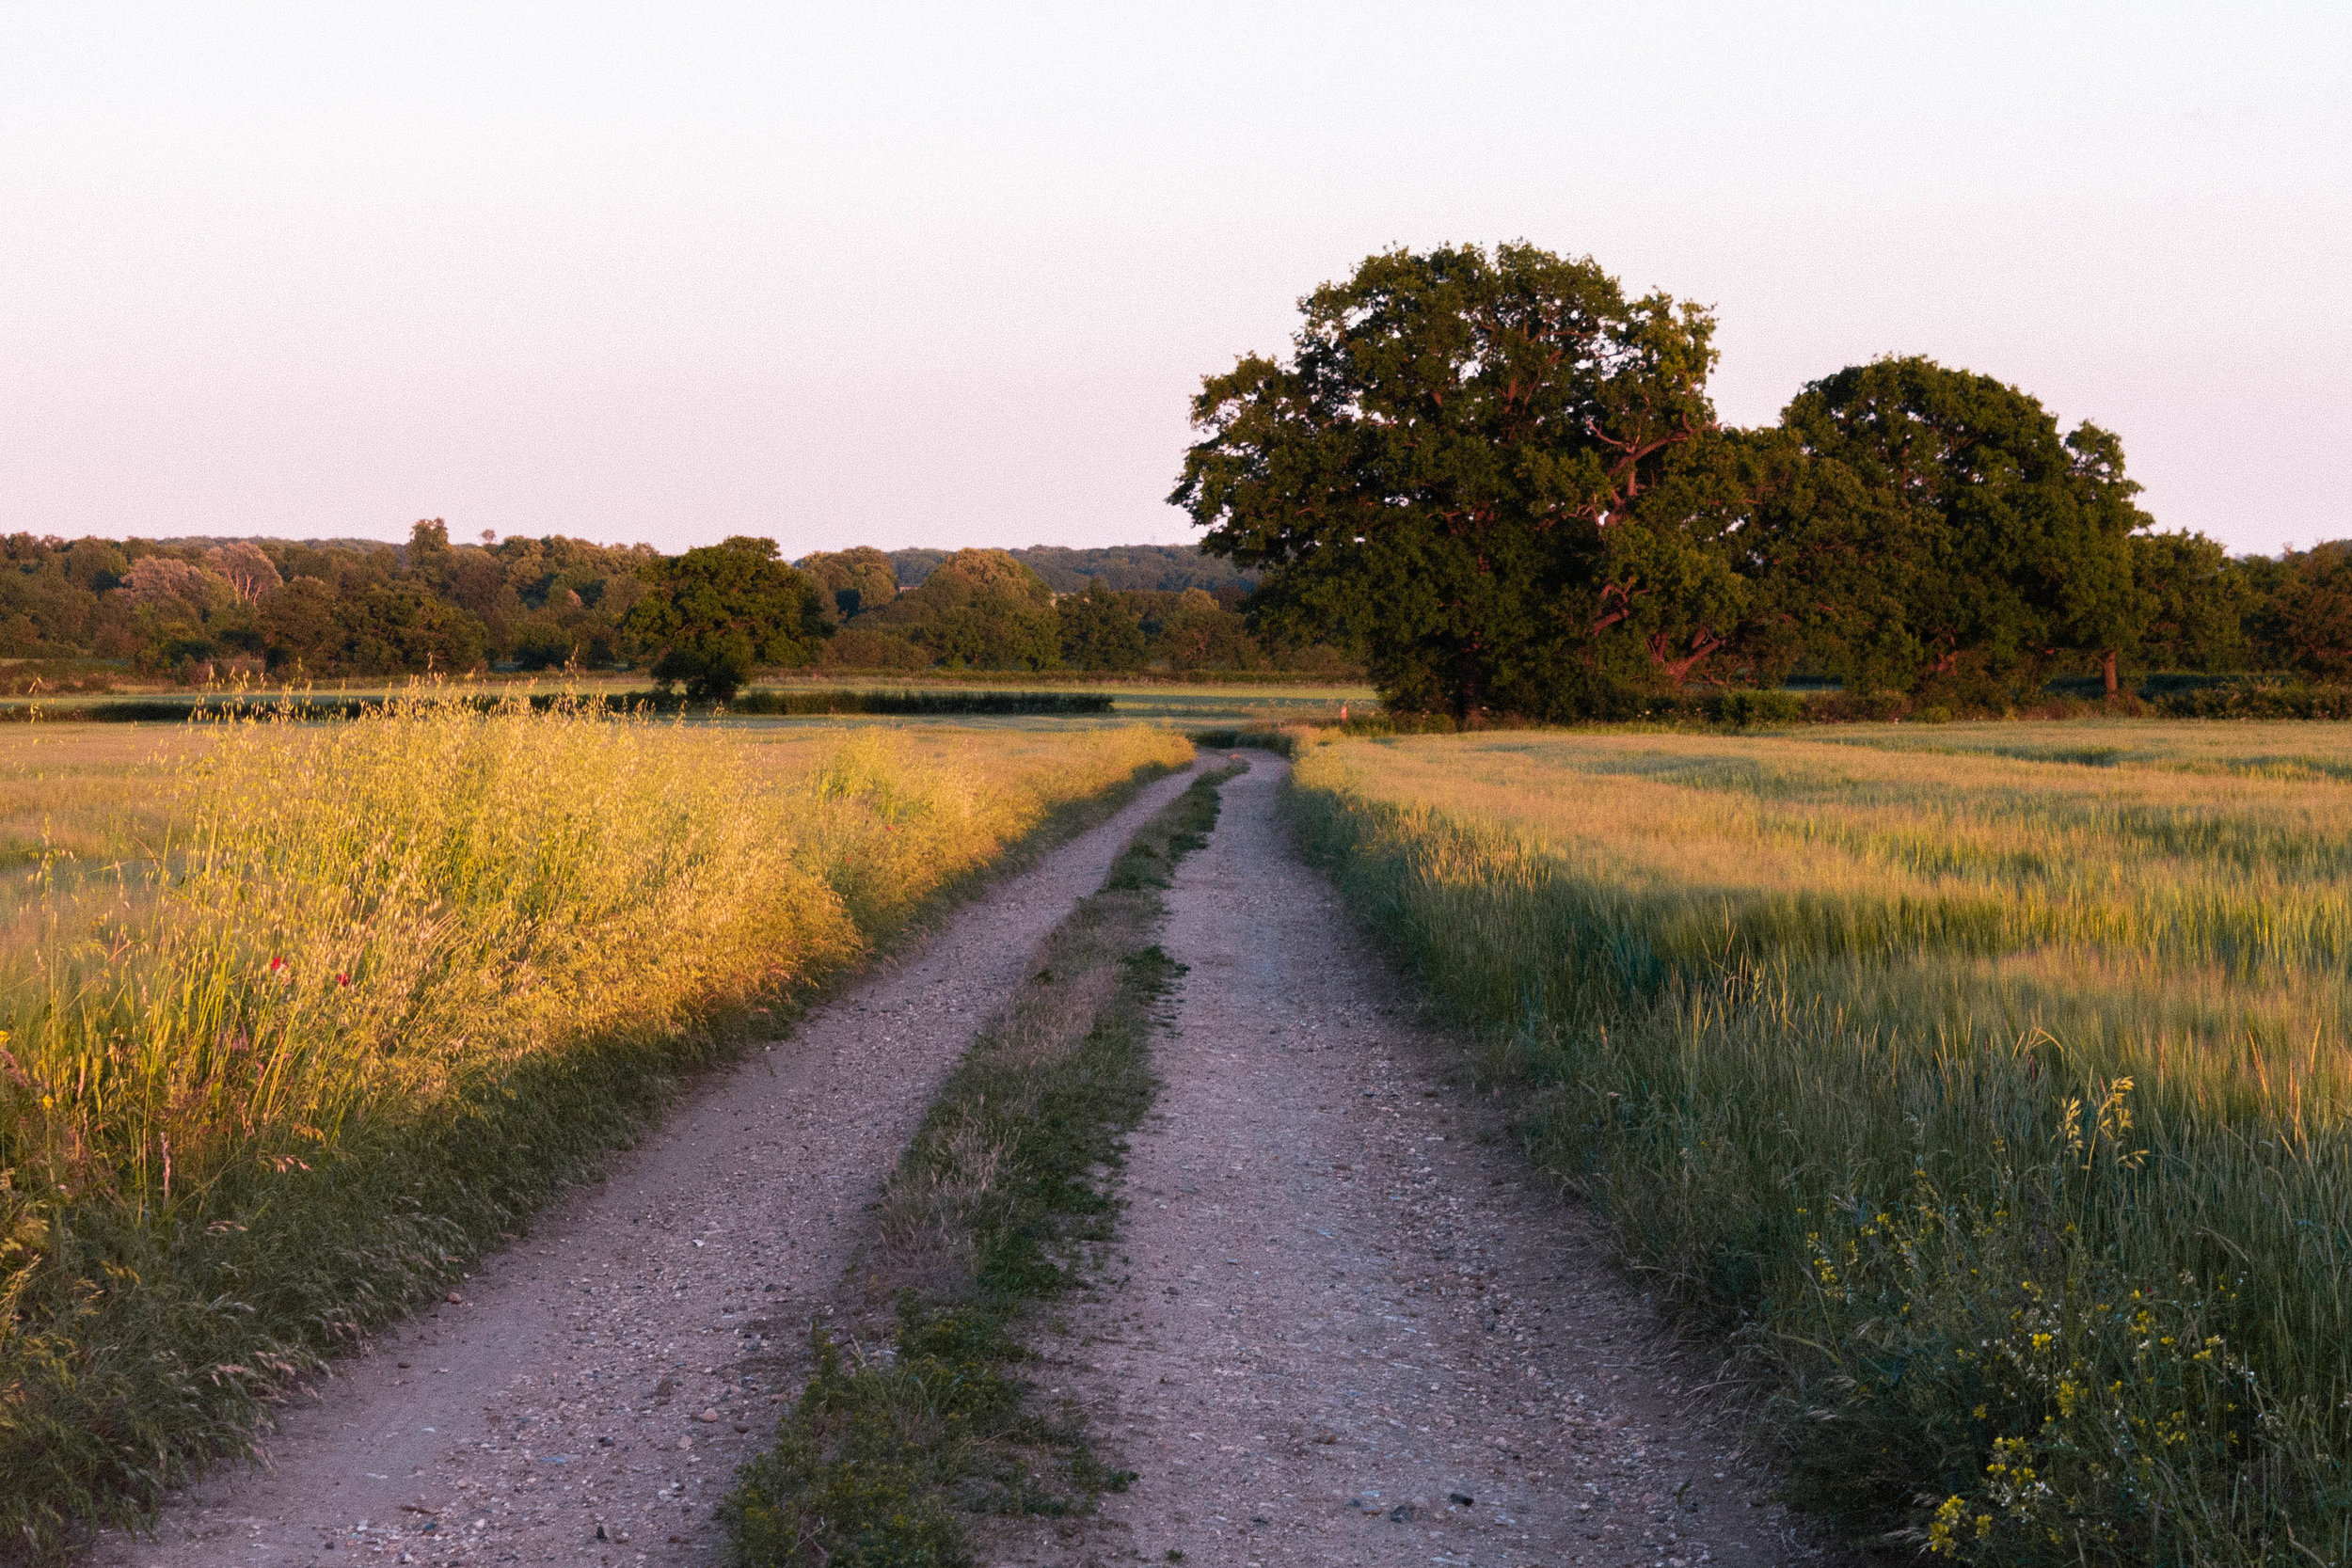 Dirt track, summer walk, field, dusk